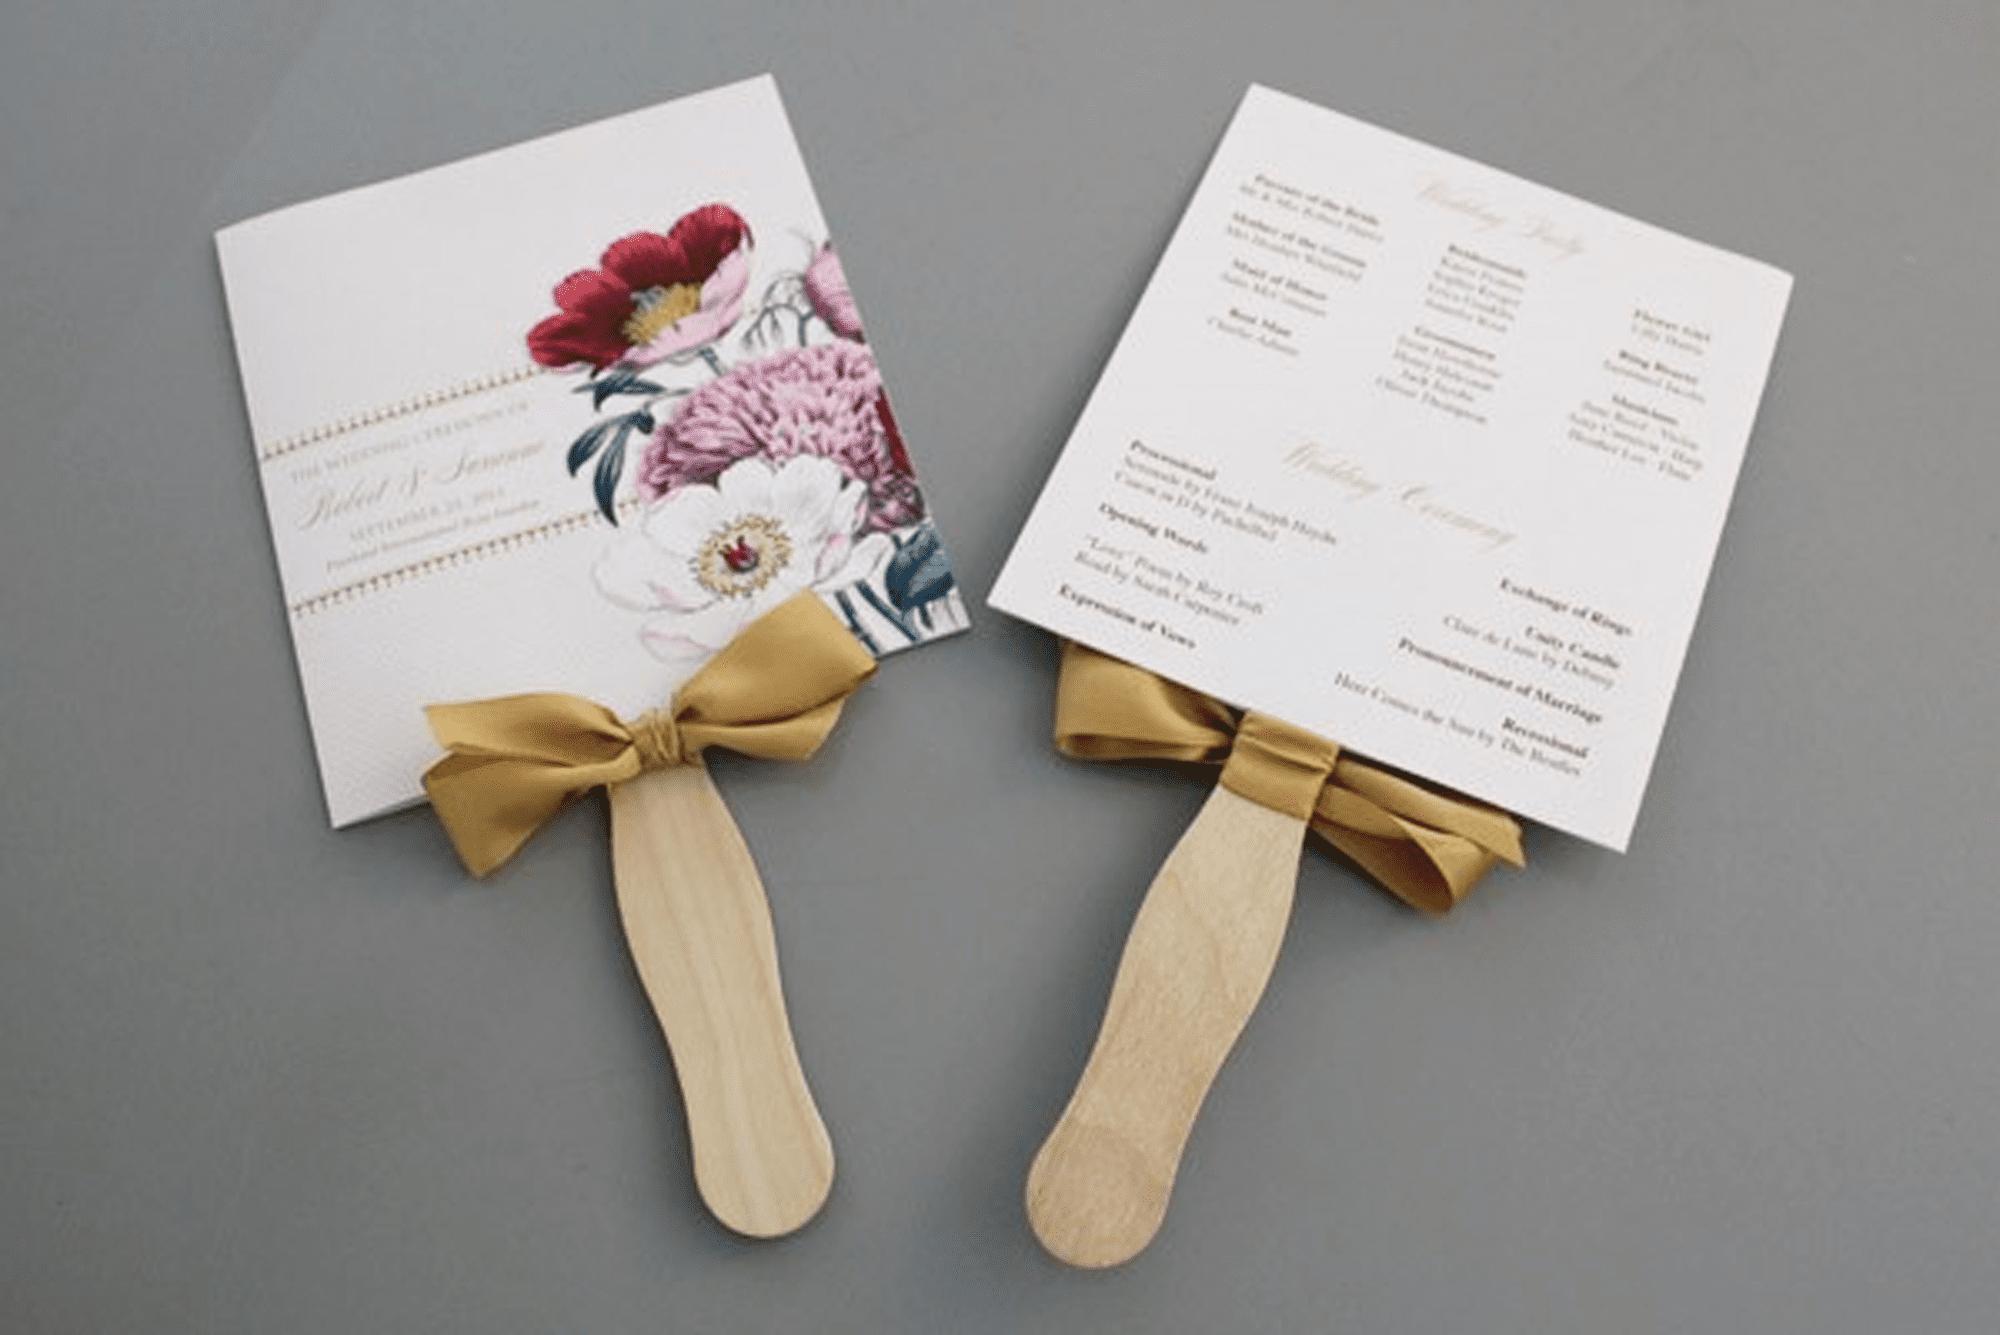 Free Wedding Program Templates You Can Customize - Free Printable Fan Wedding Programs